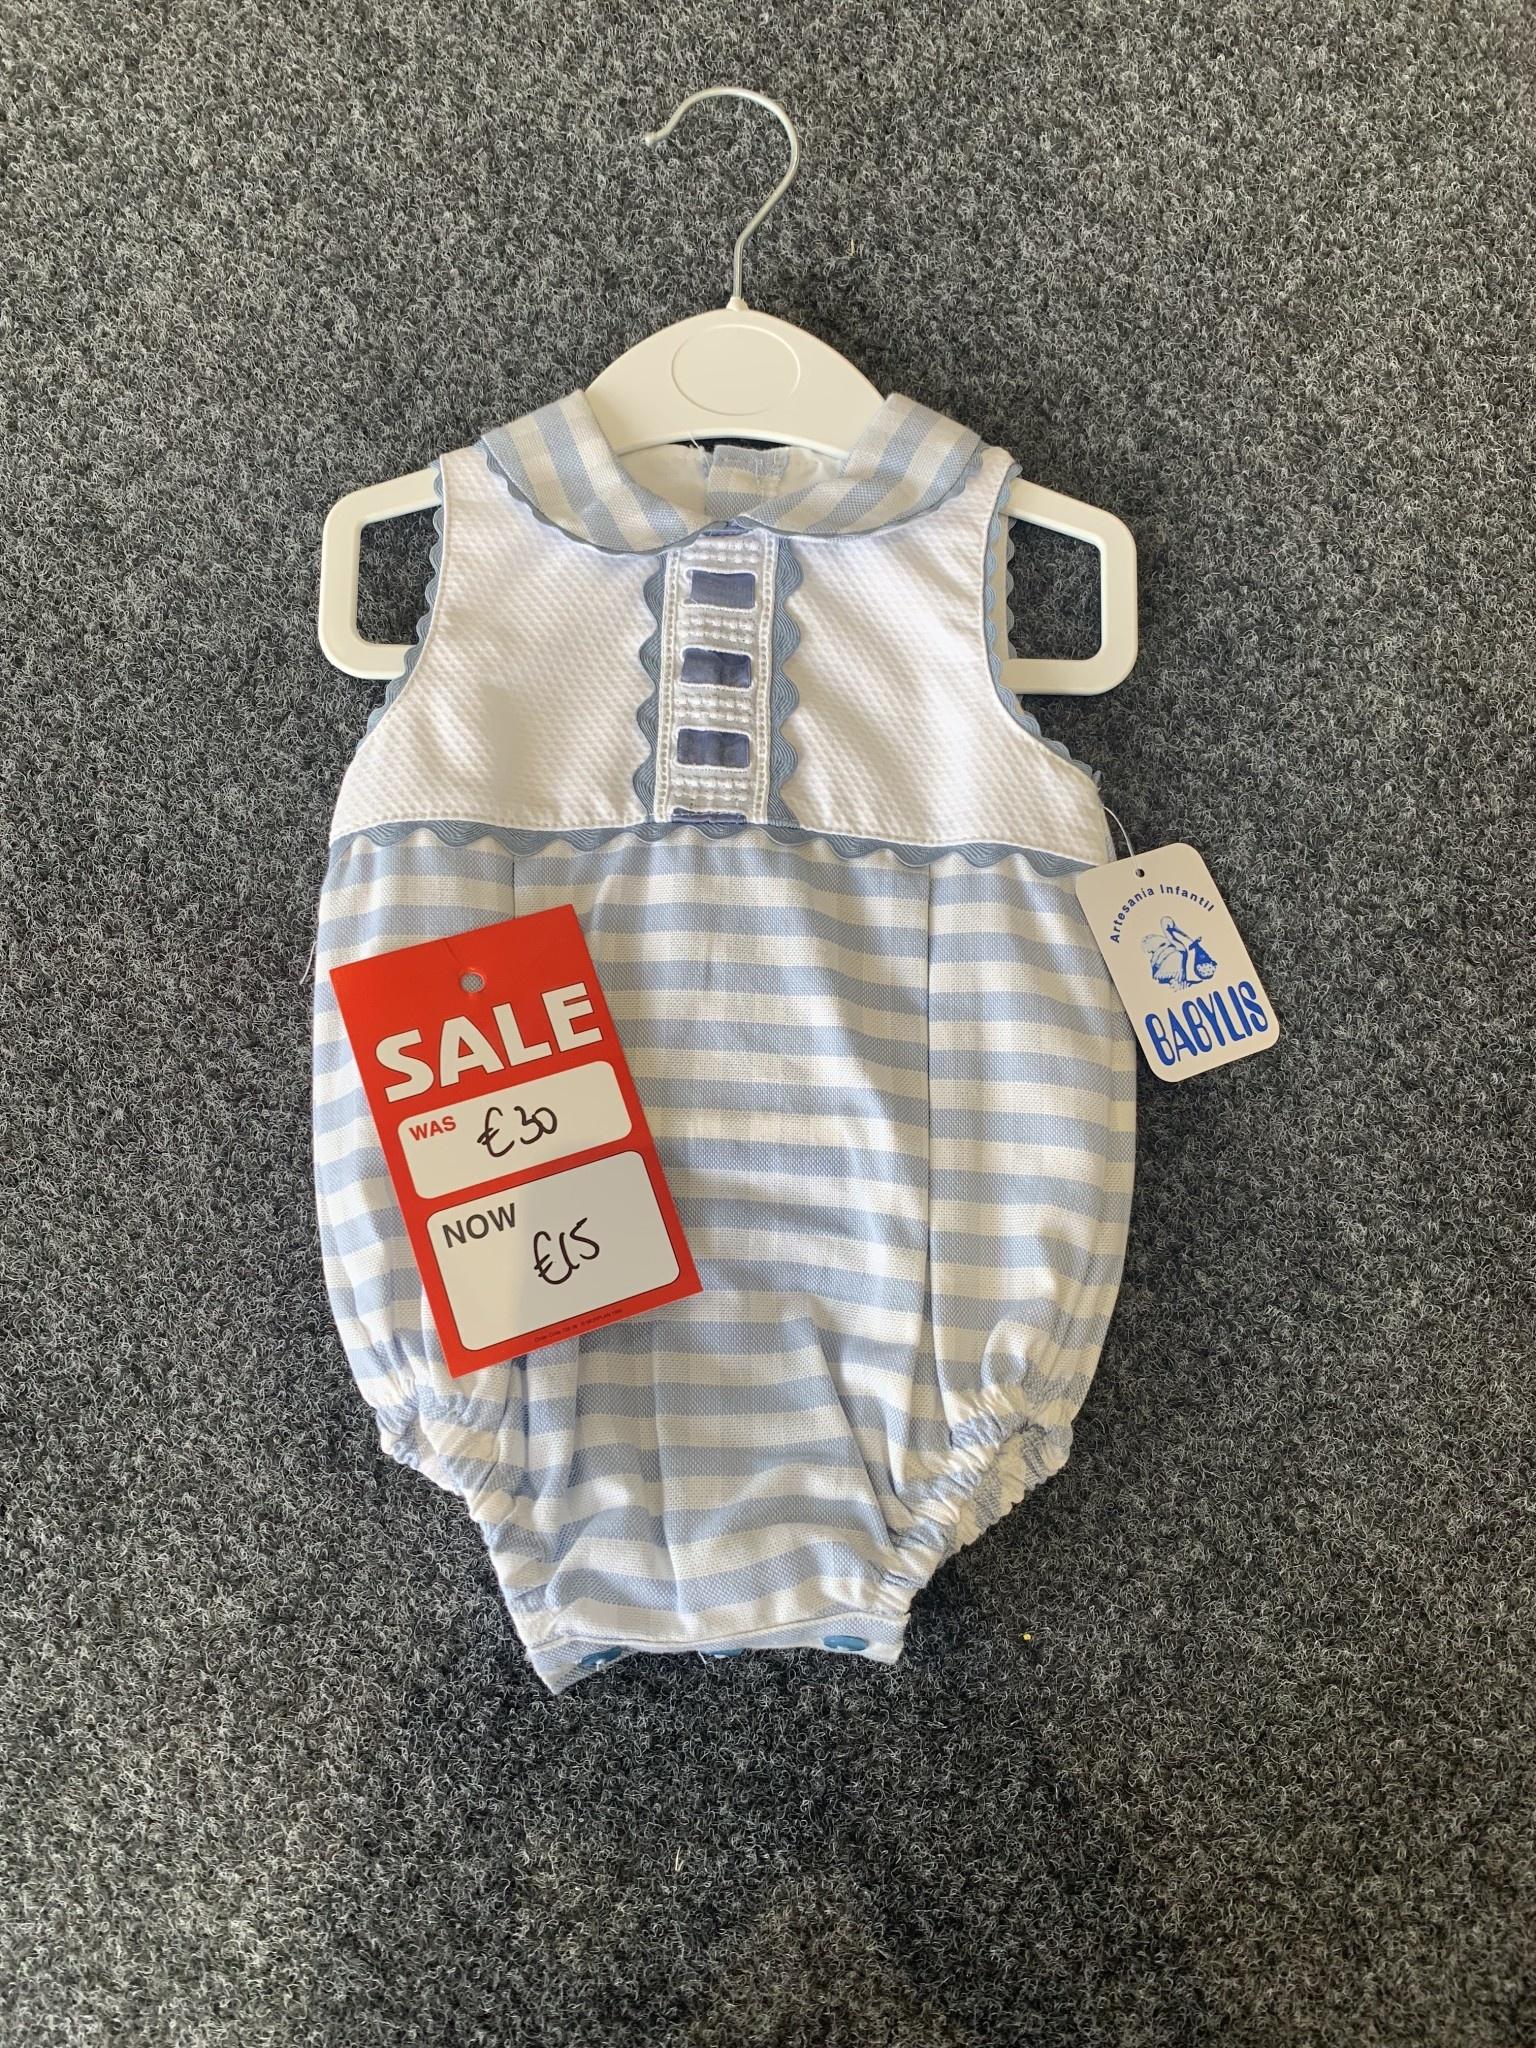 BABYLIS Babylis Boys All In One Romper Summer Sale